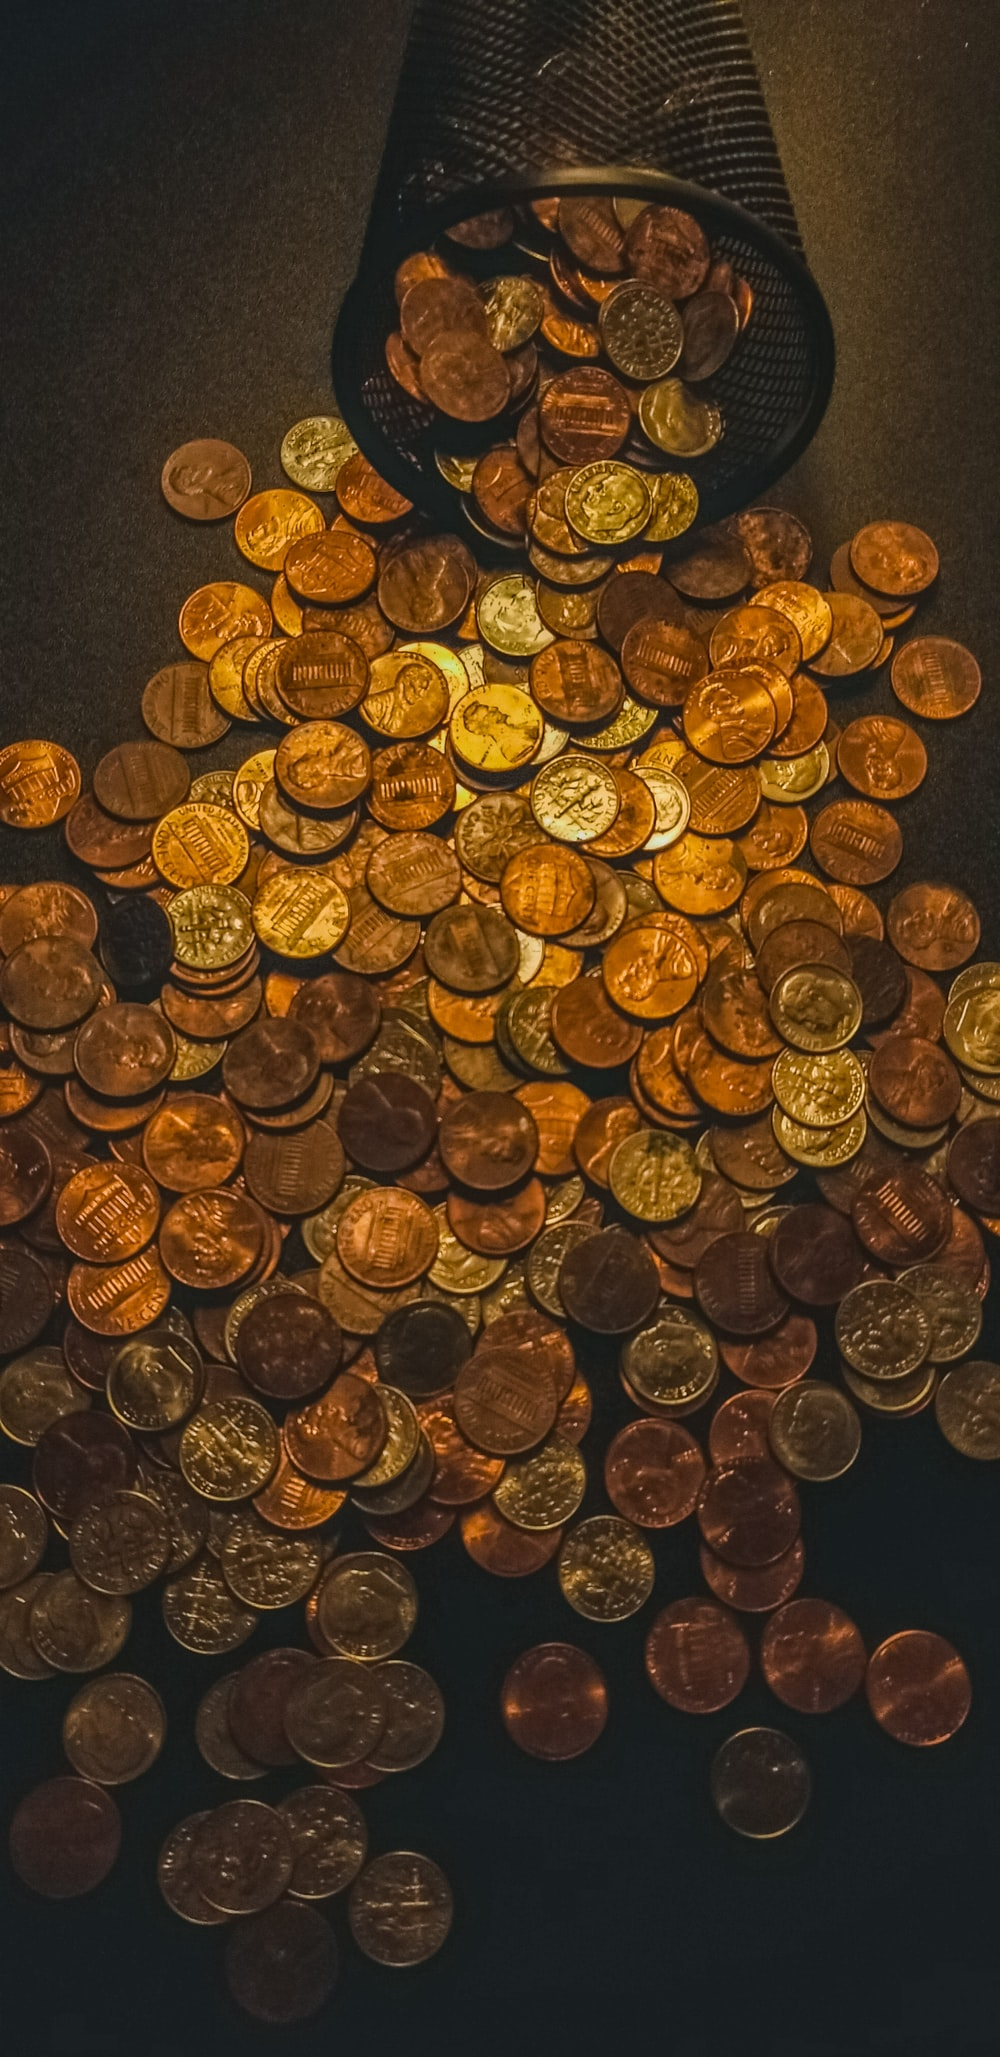 gold round coins on black textile